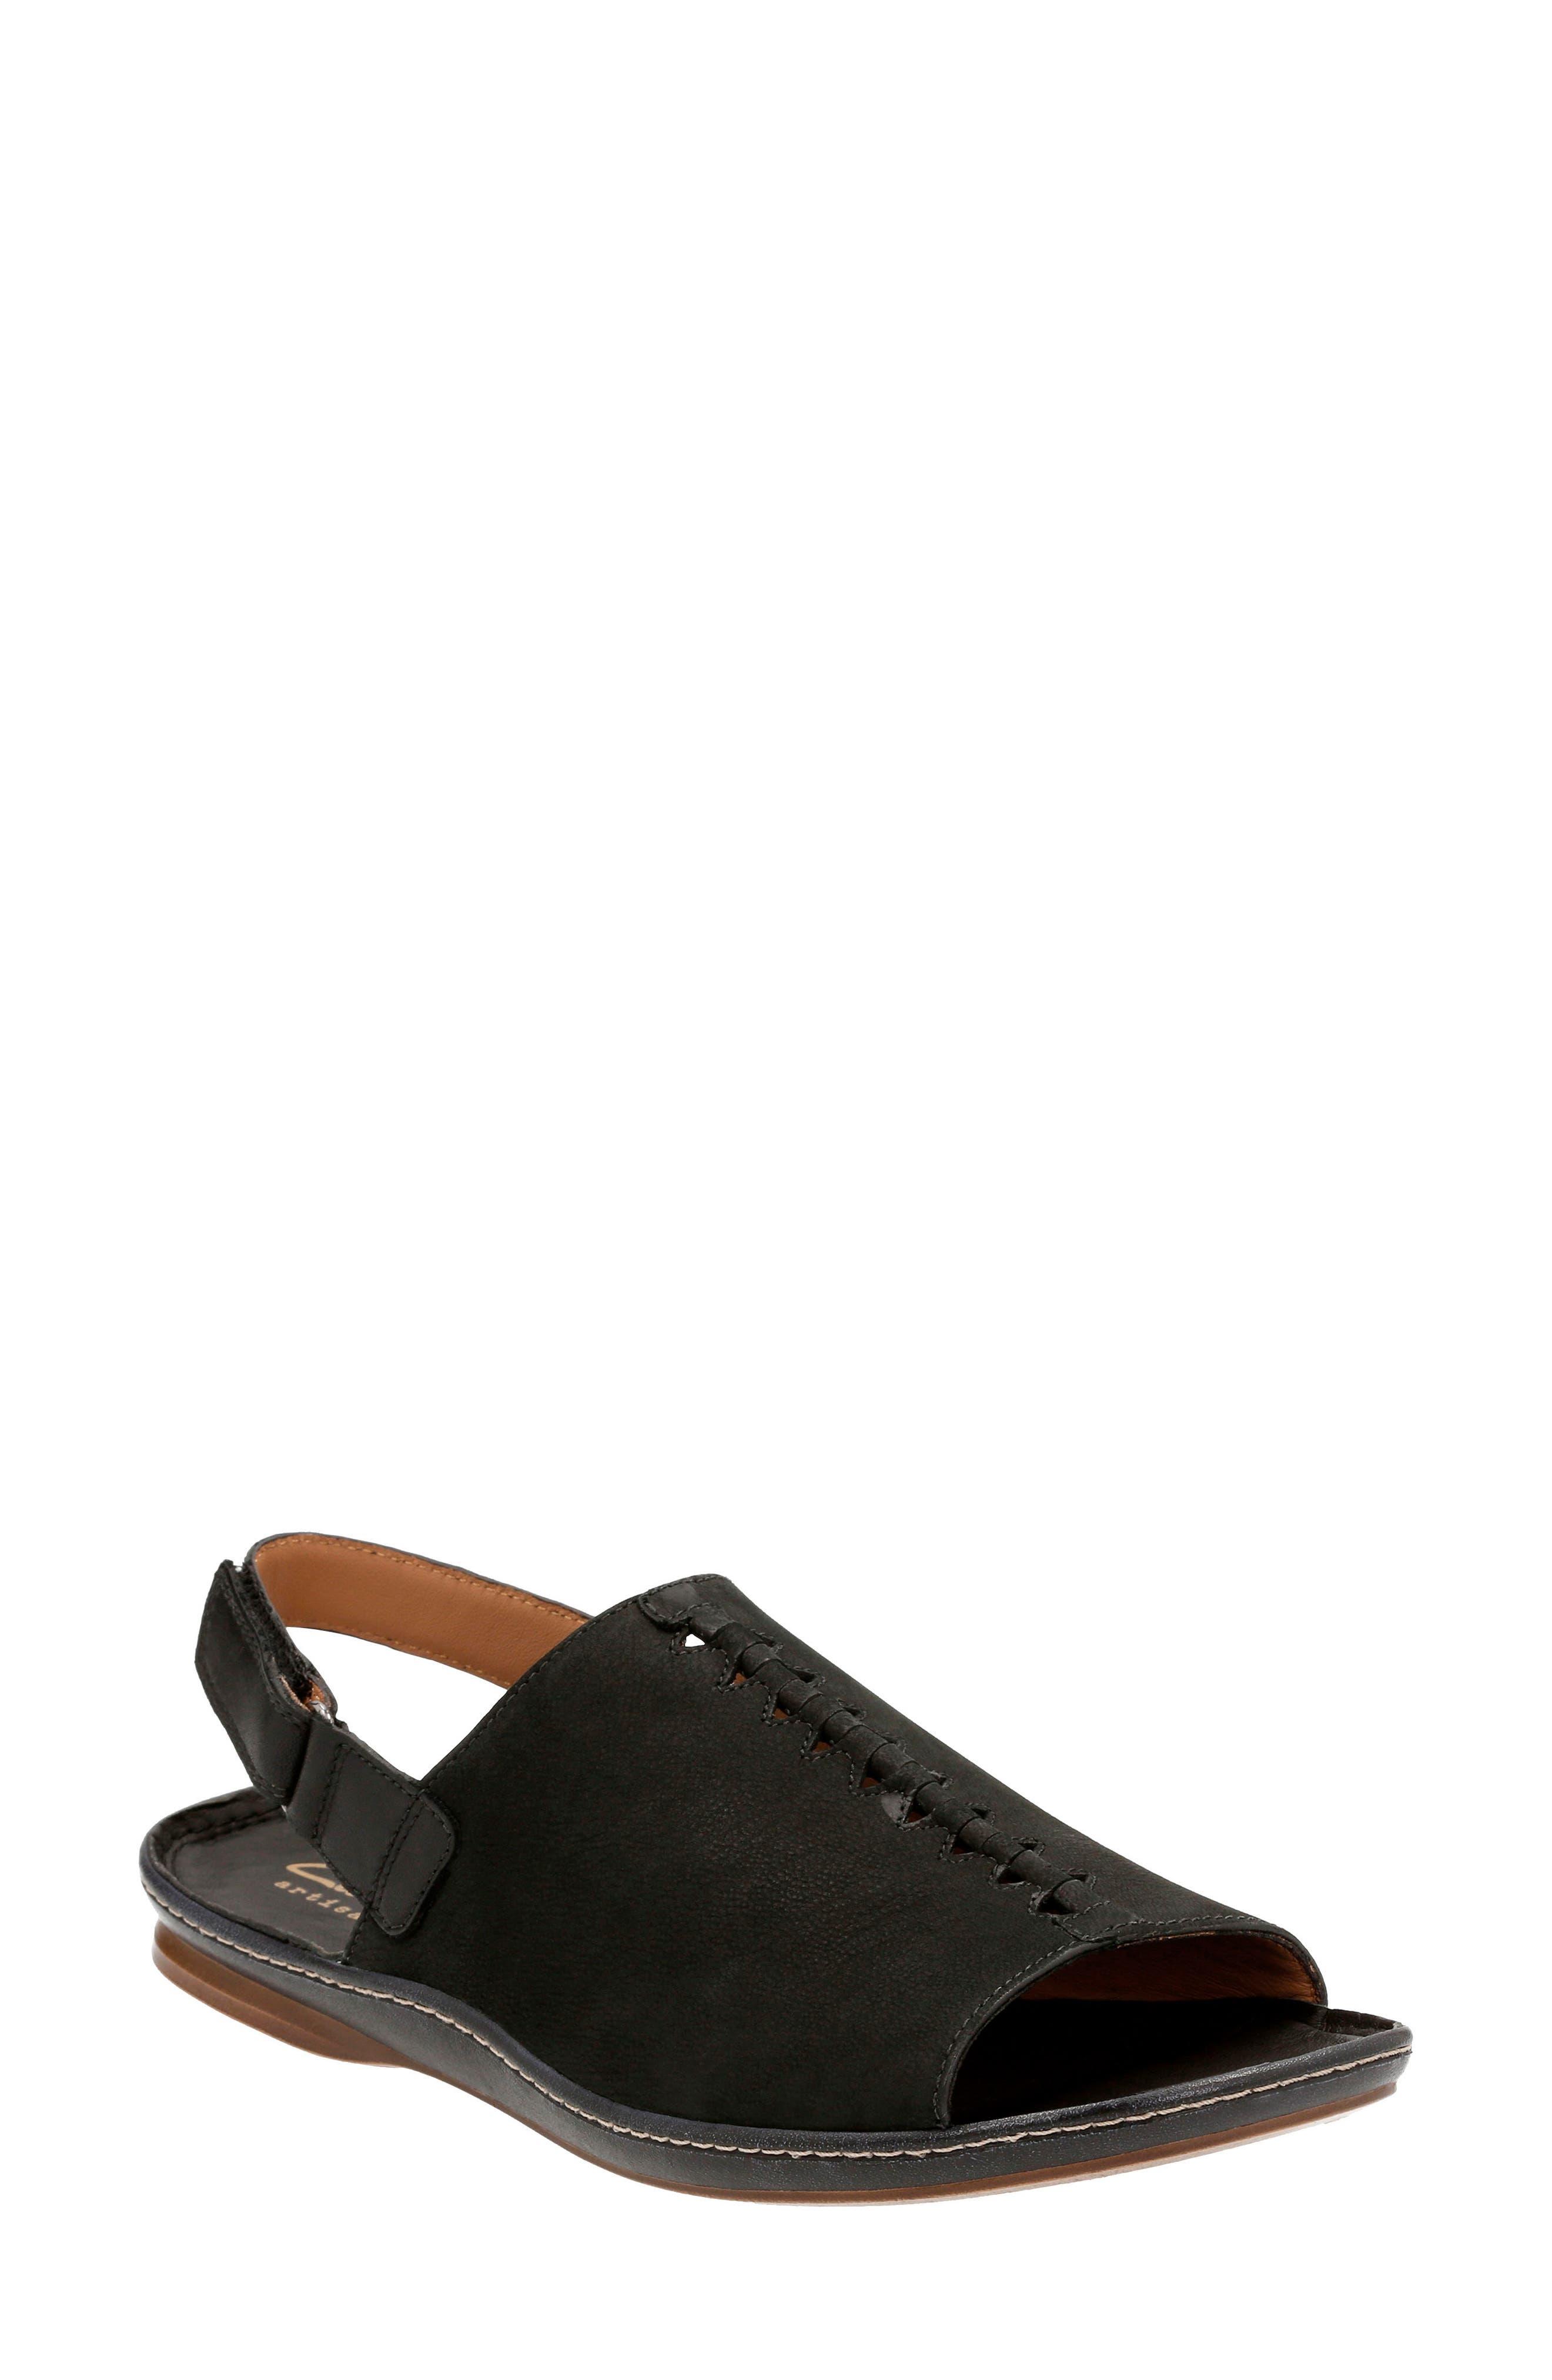 CLARKS<SUP>®</SUP> Sarla Forte Sandal